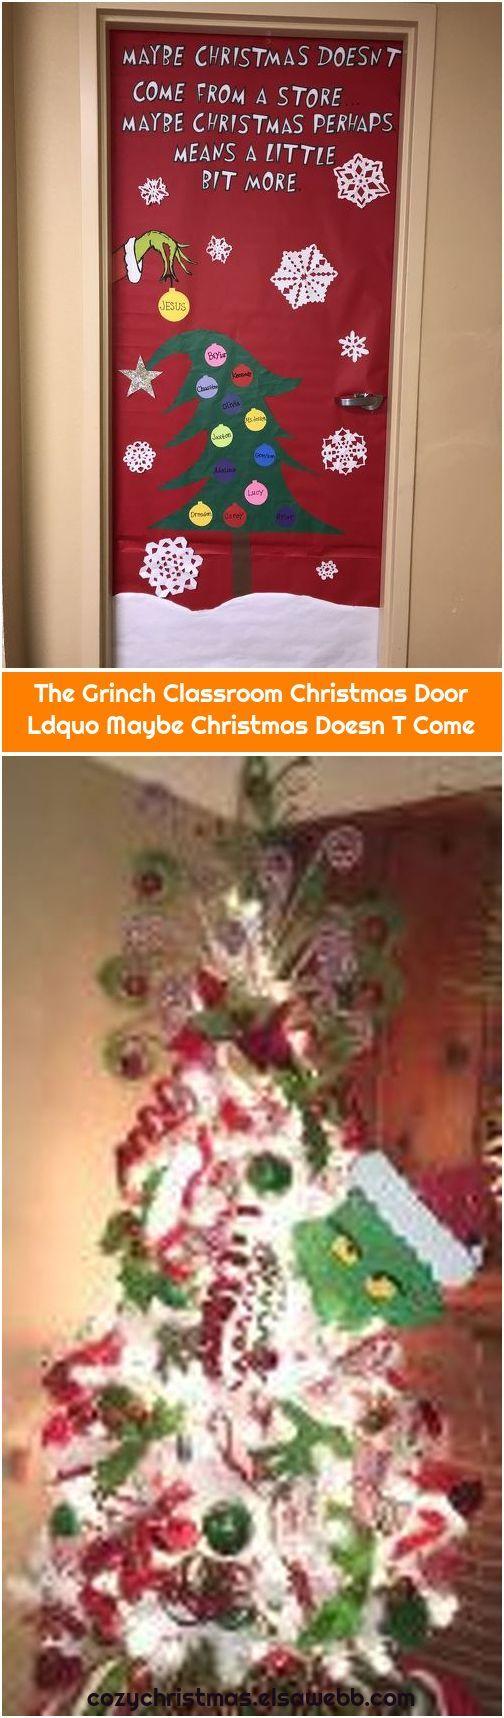 The Grinch Classroom Christmas Door Ldquo Maybe Christmas ...